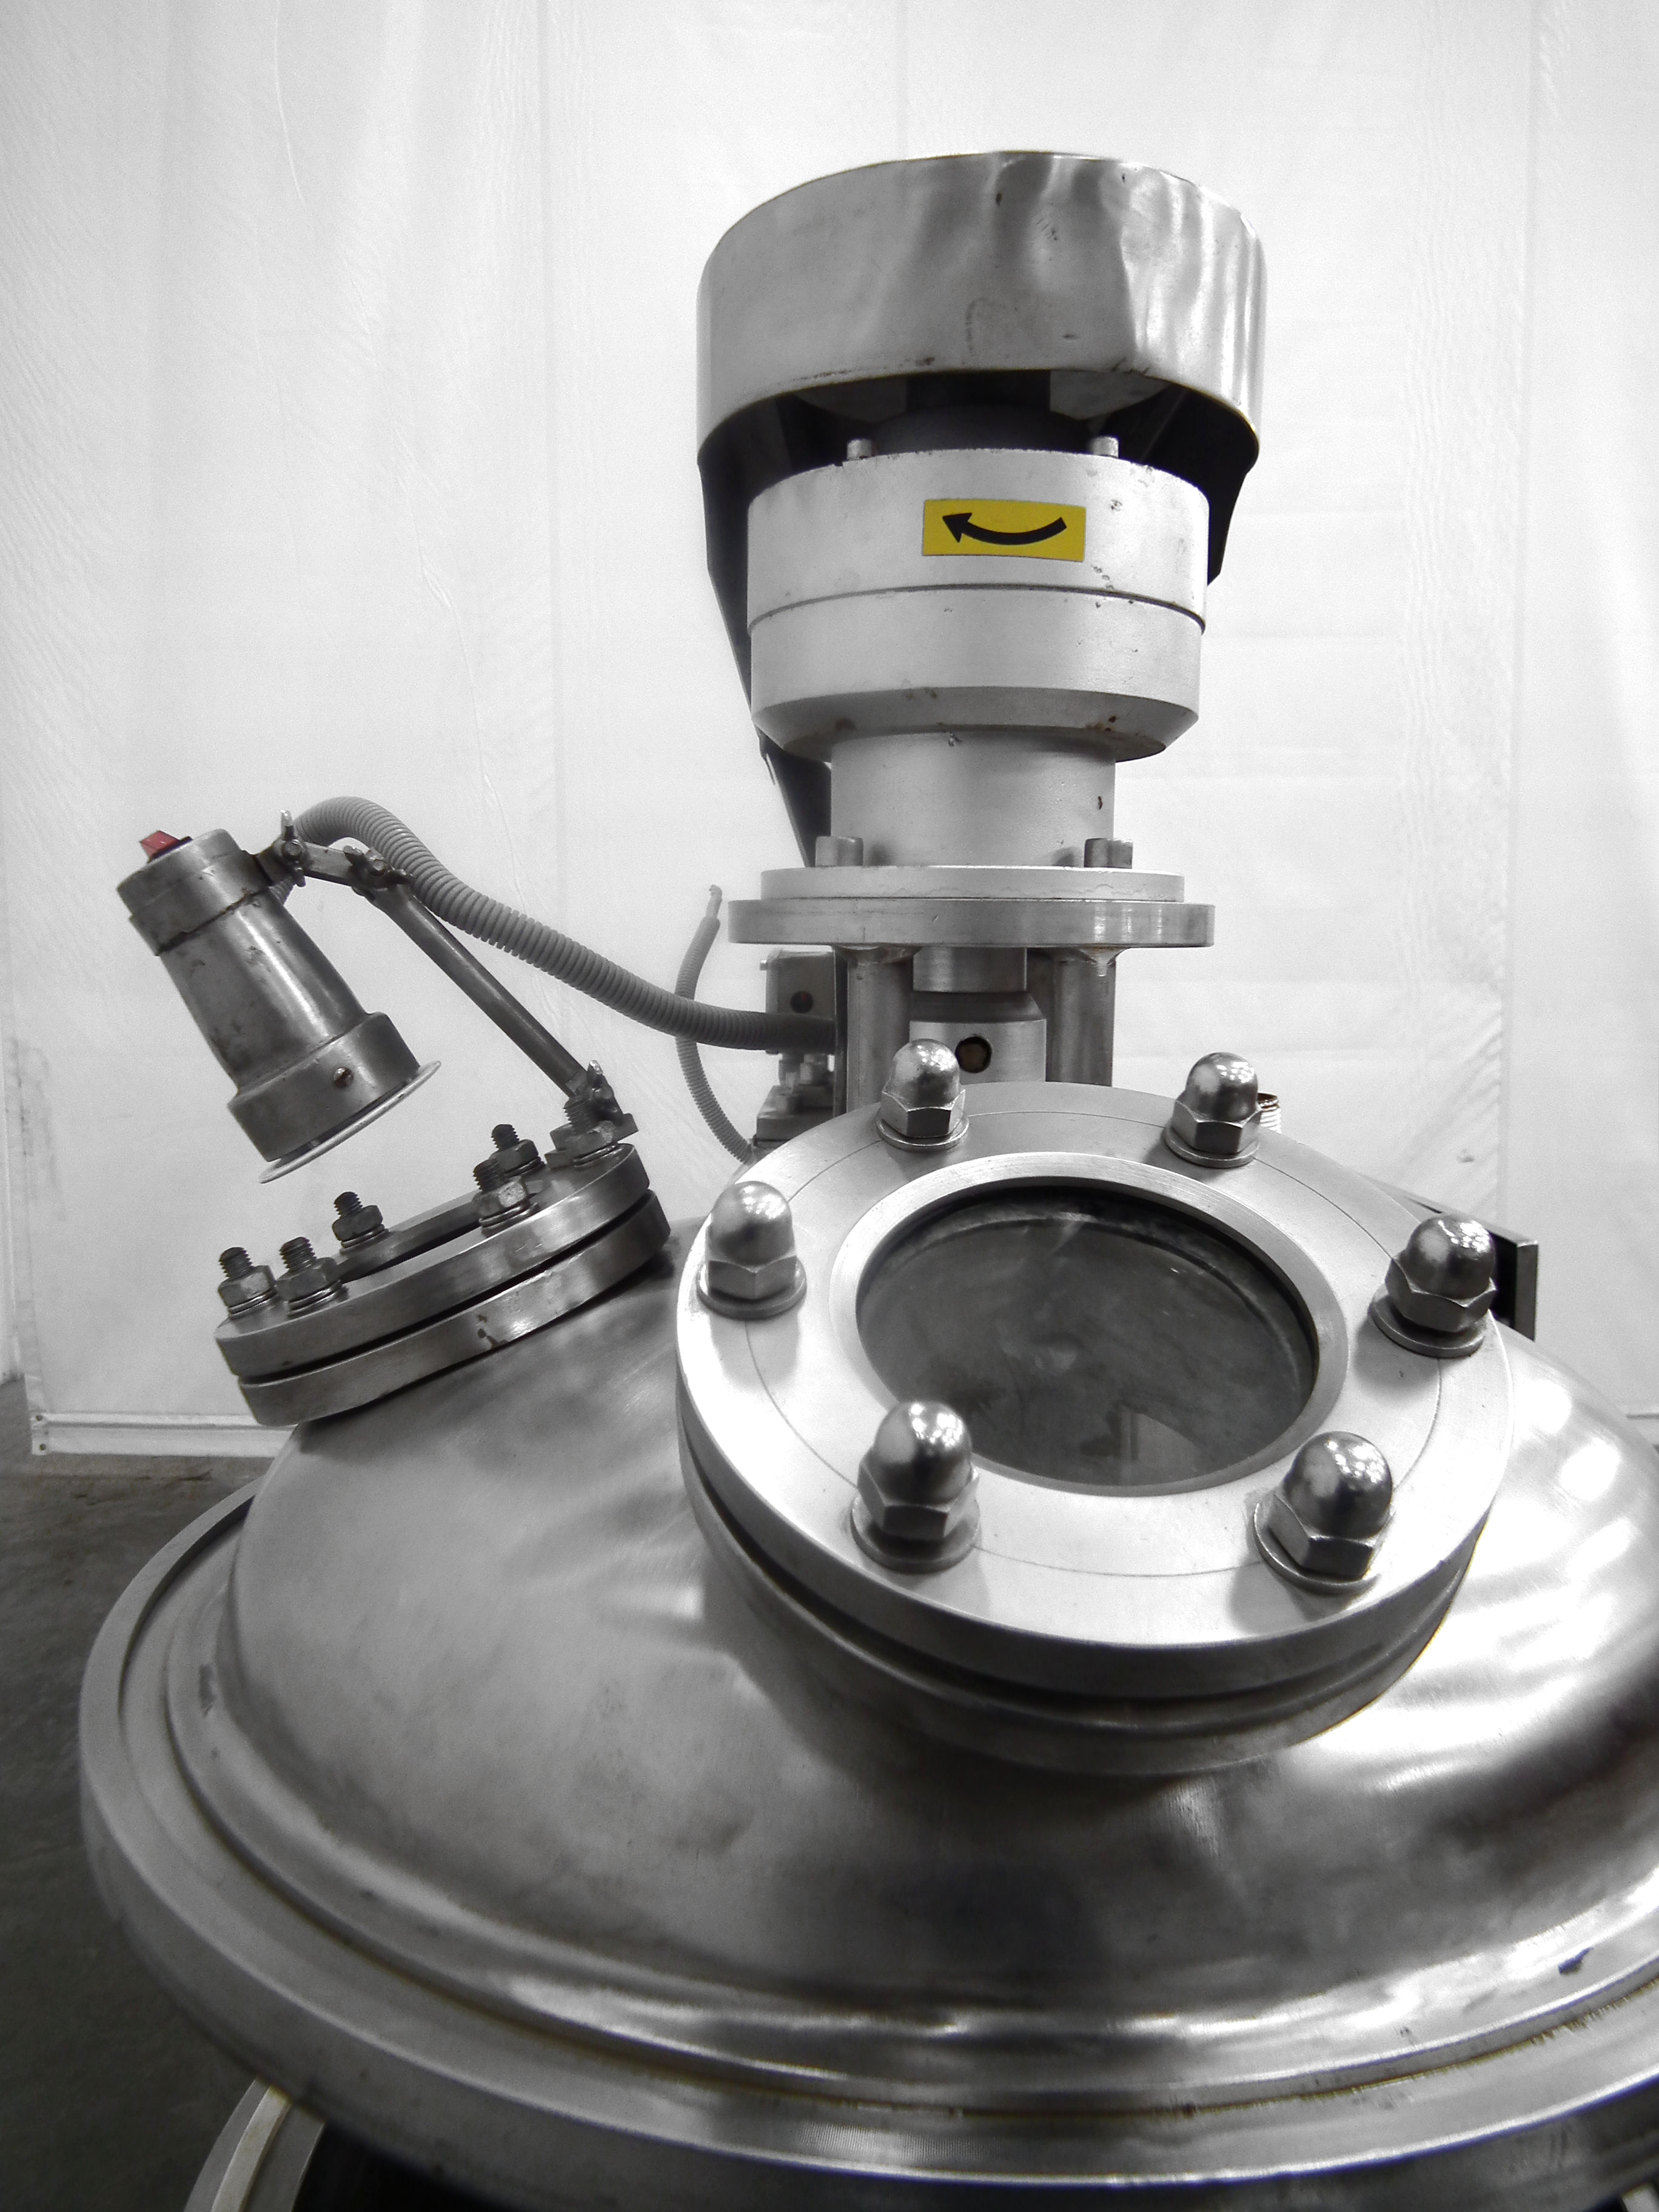 Mega Engineering HPE-VA 40 Gallon Pressure Mixer B3864 - Image 9 of 10